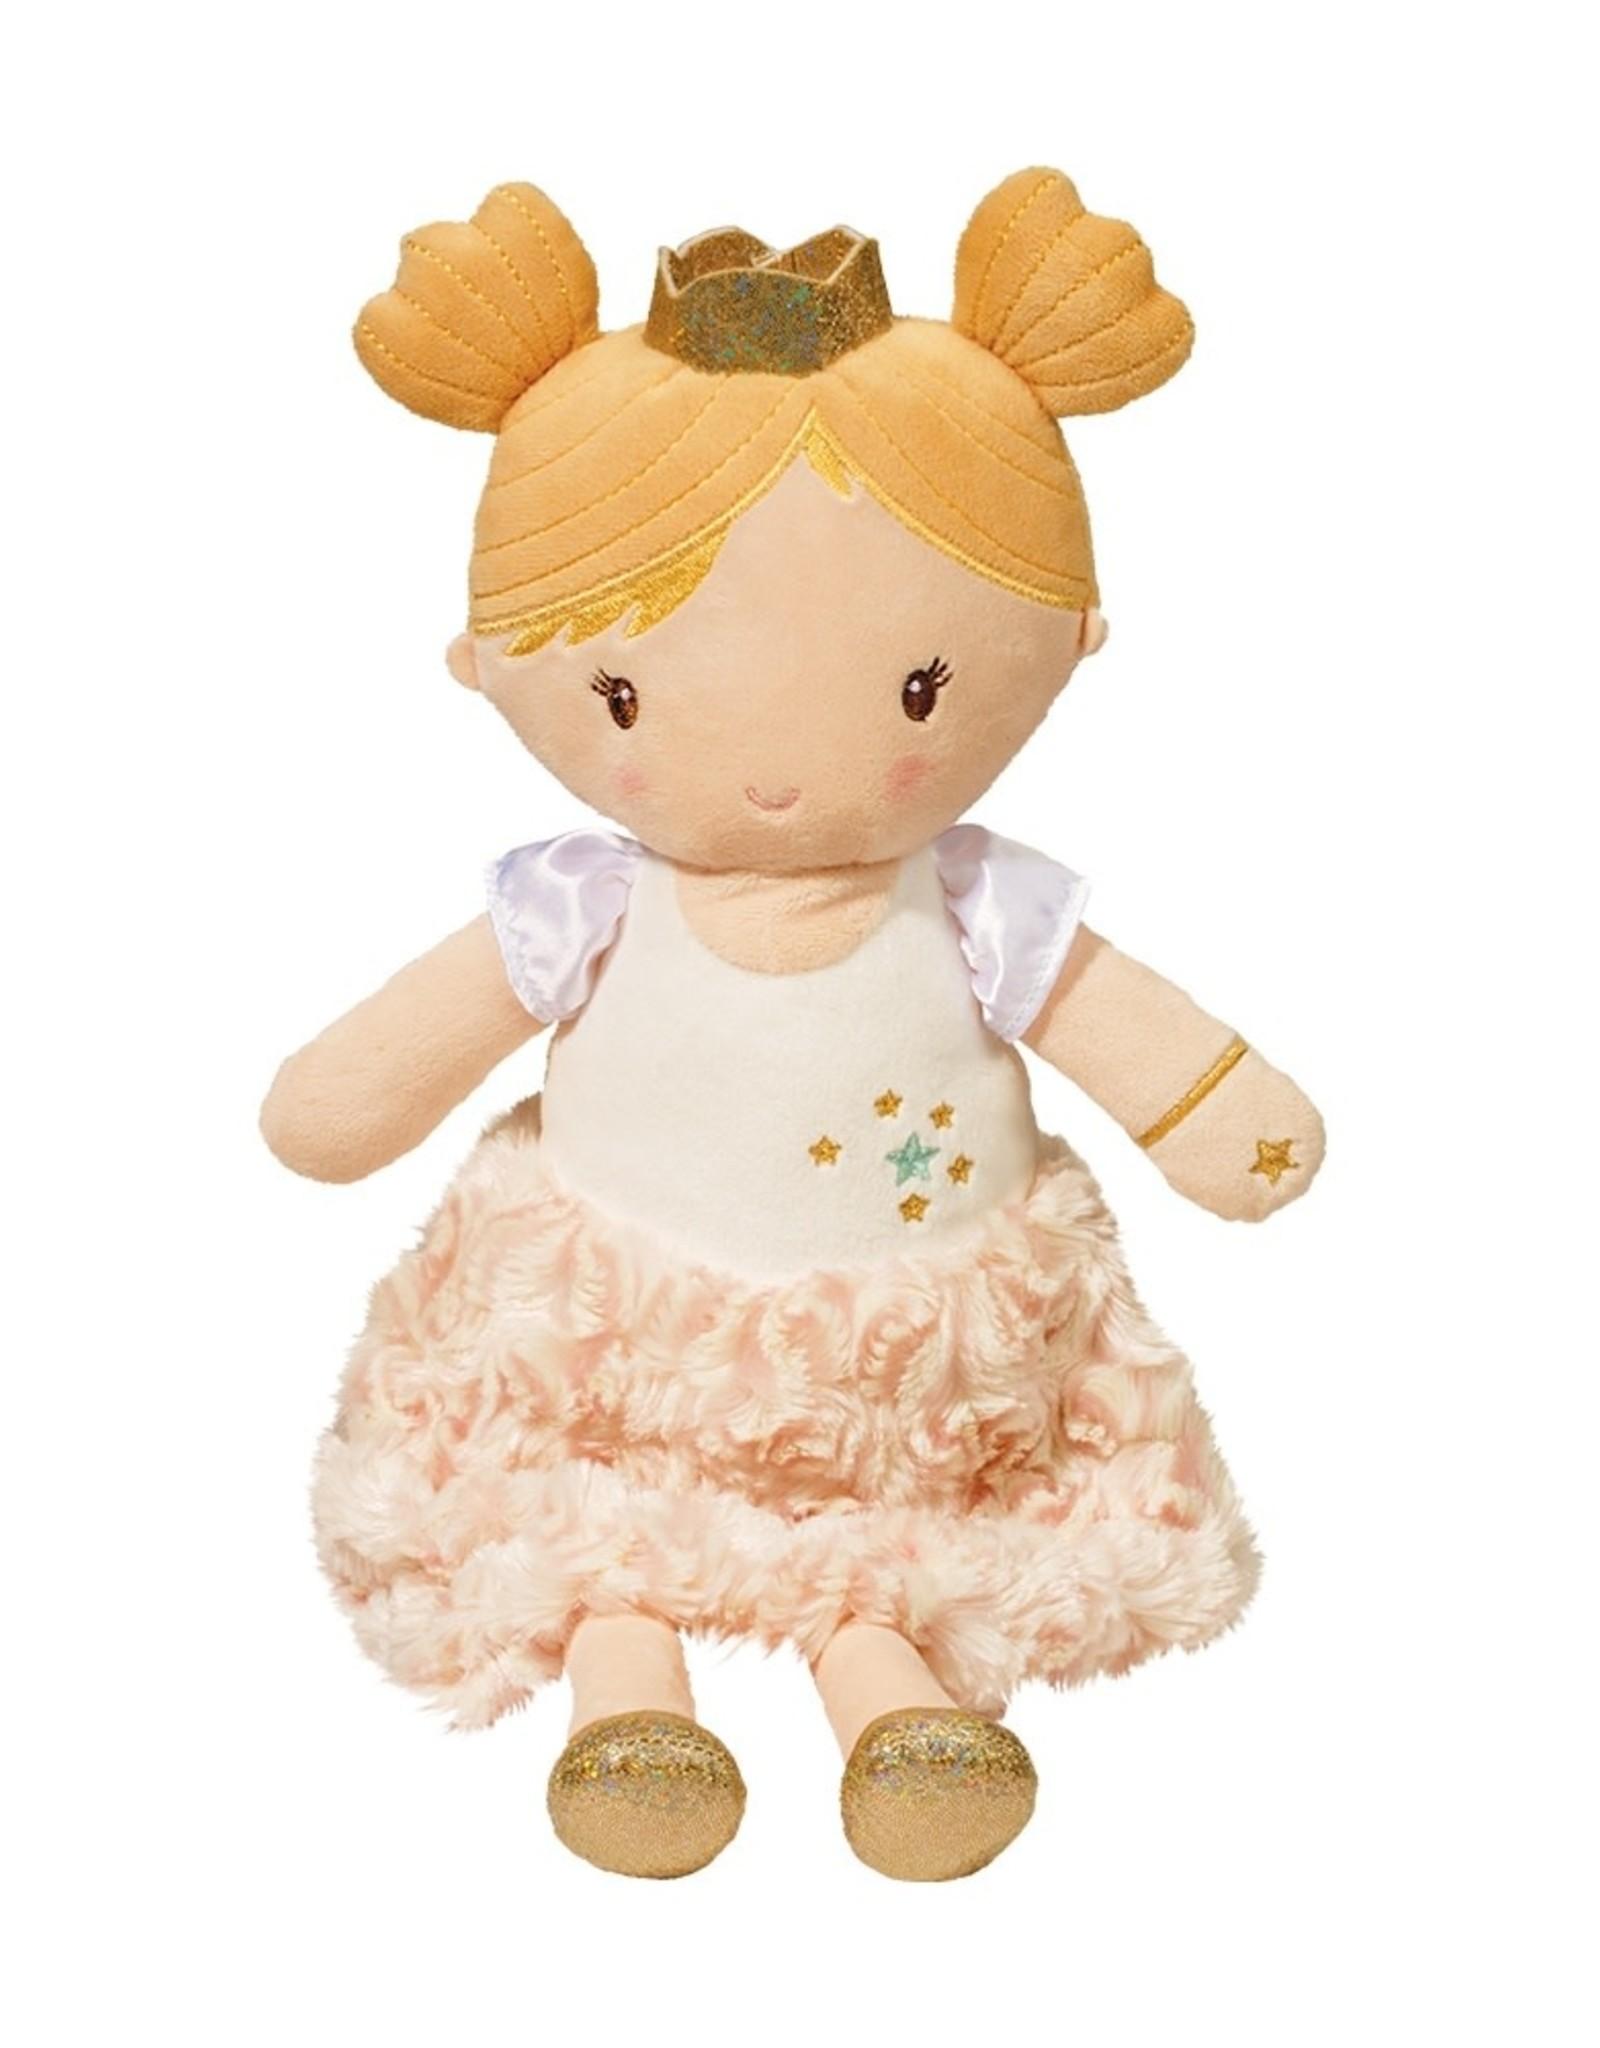 Douglas Doll Plumpie Princess Noa